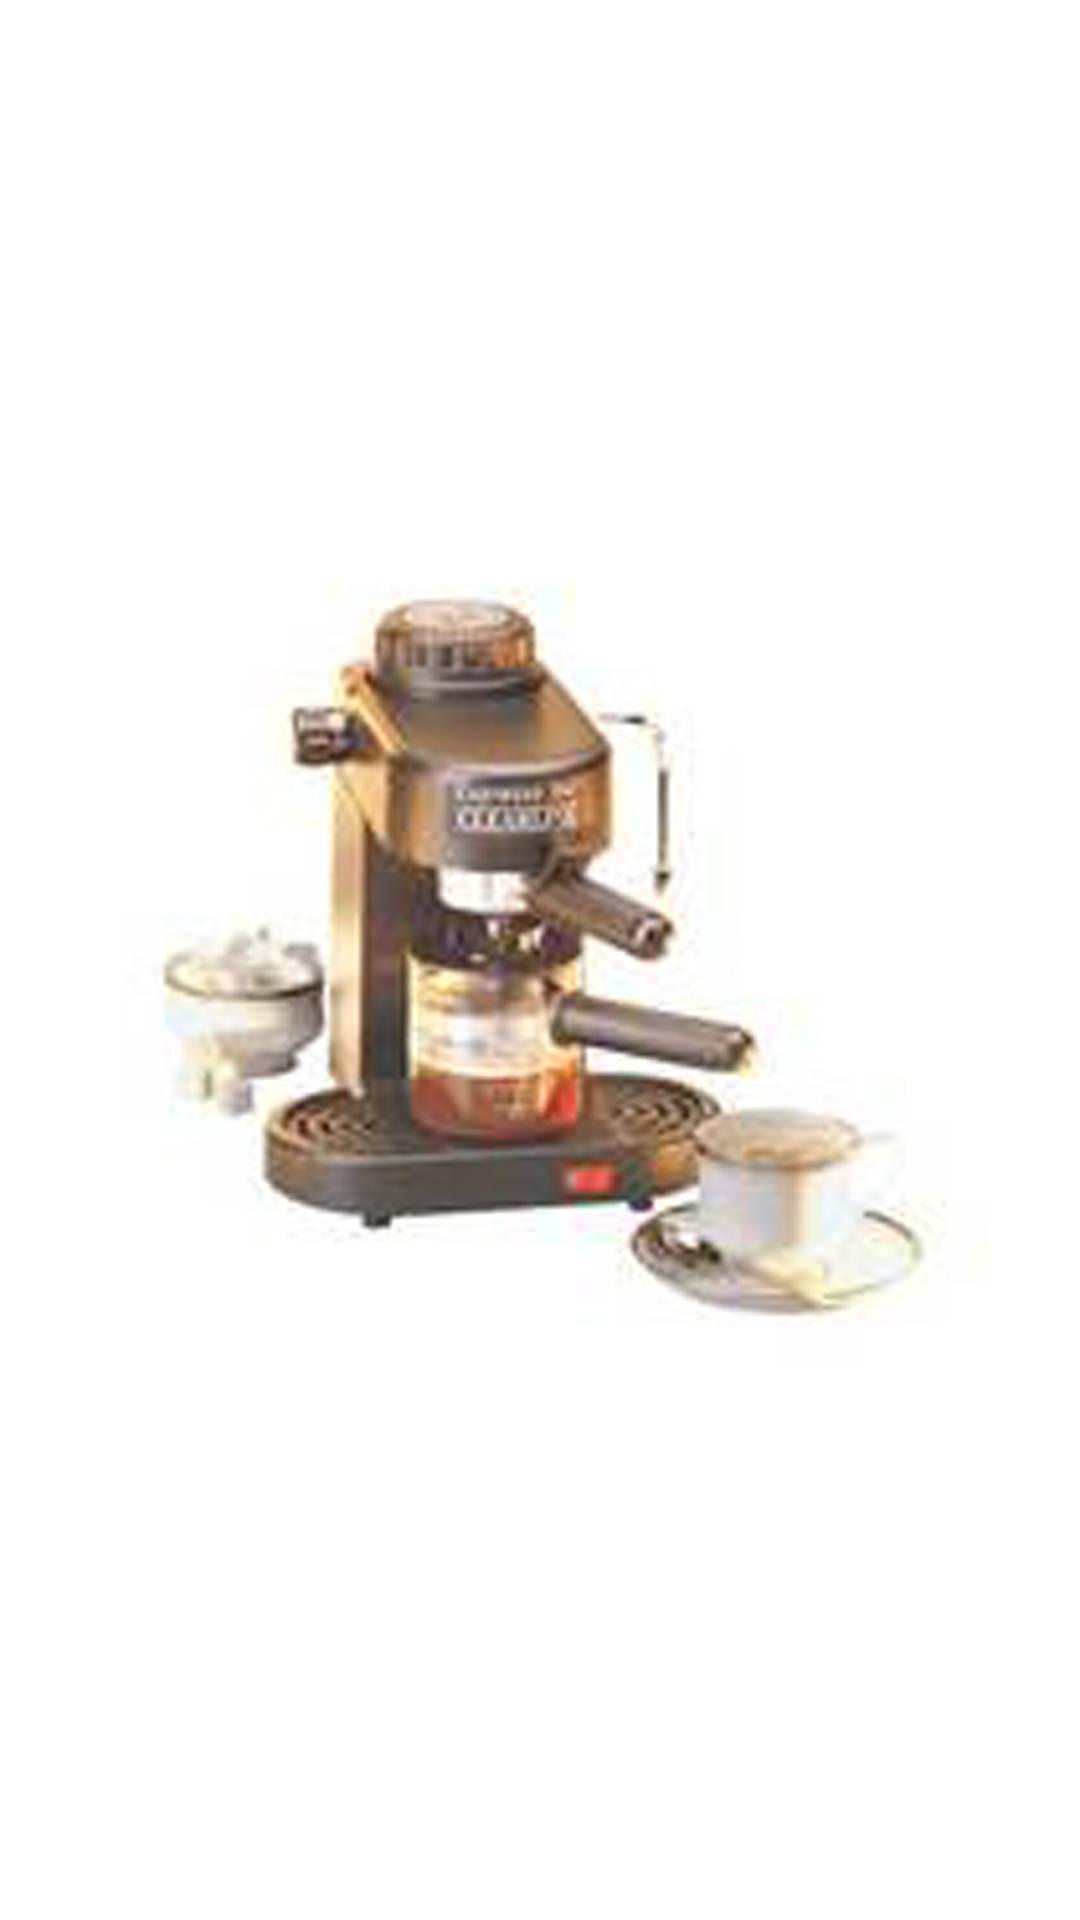 Clearline Espresso Bar Coffee Maker